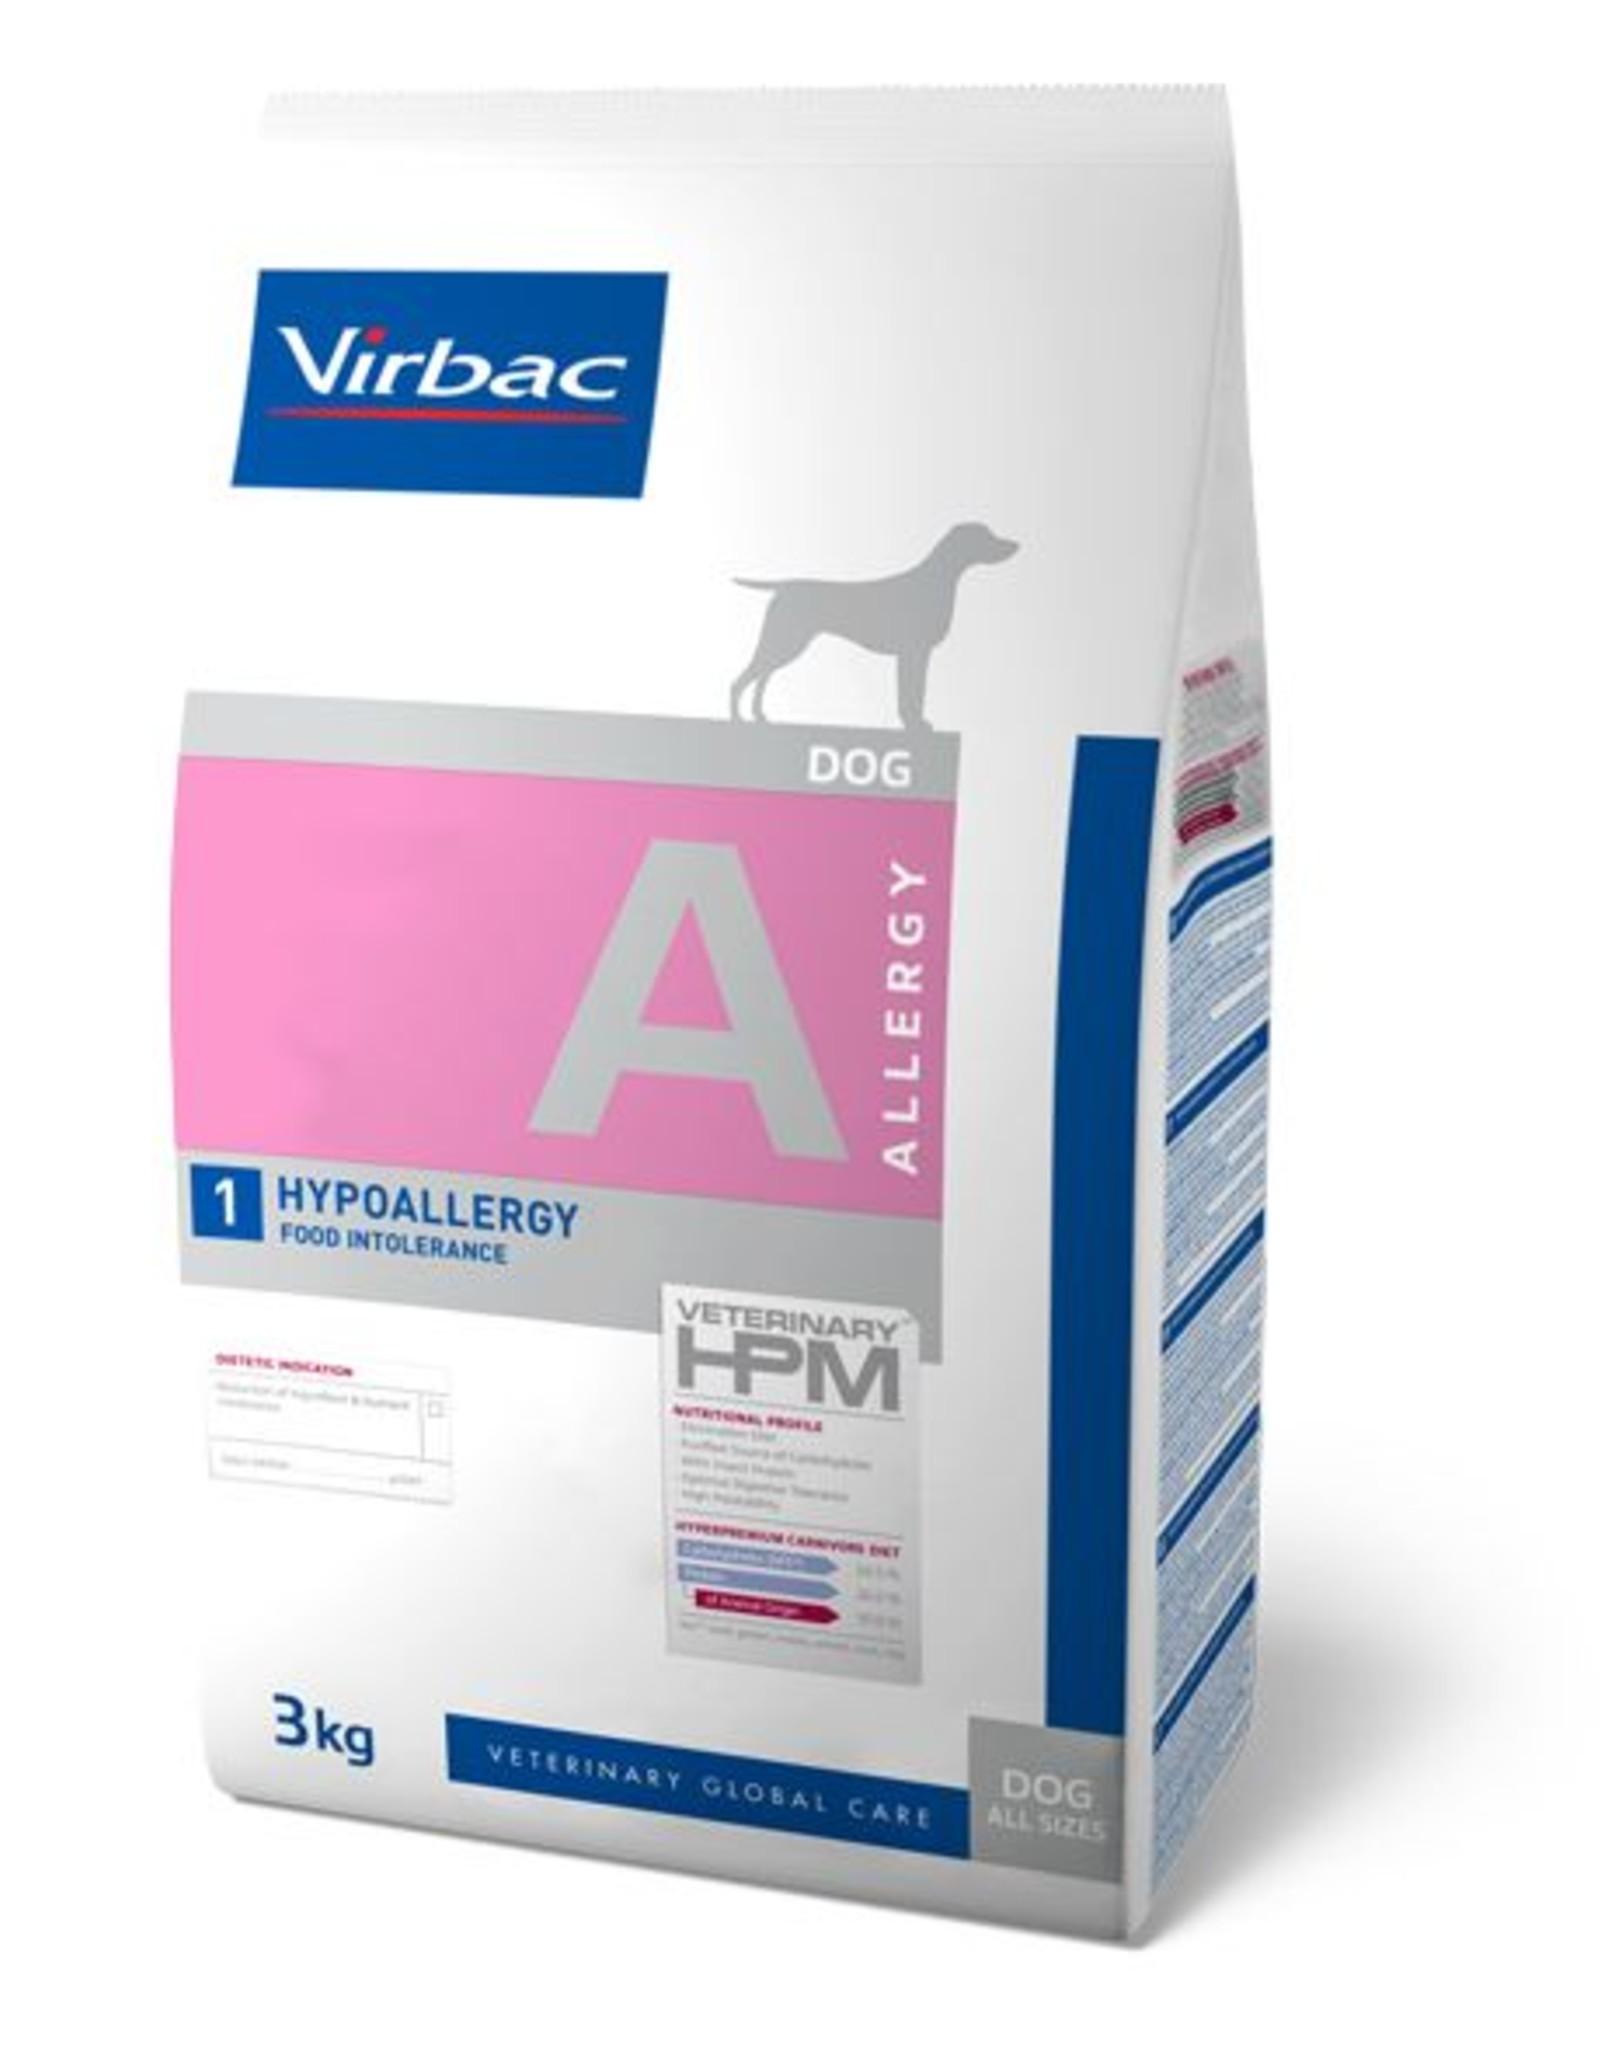 Virbac Virbac Hpm Chien Hypo Allergy A1 12kg